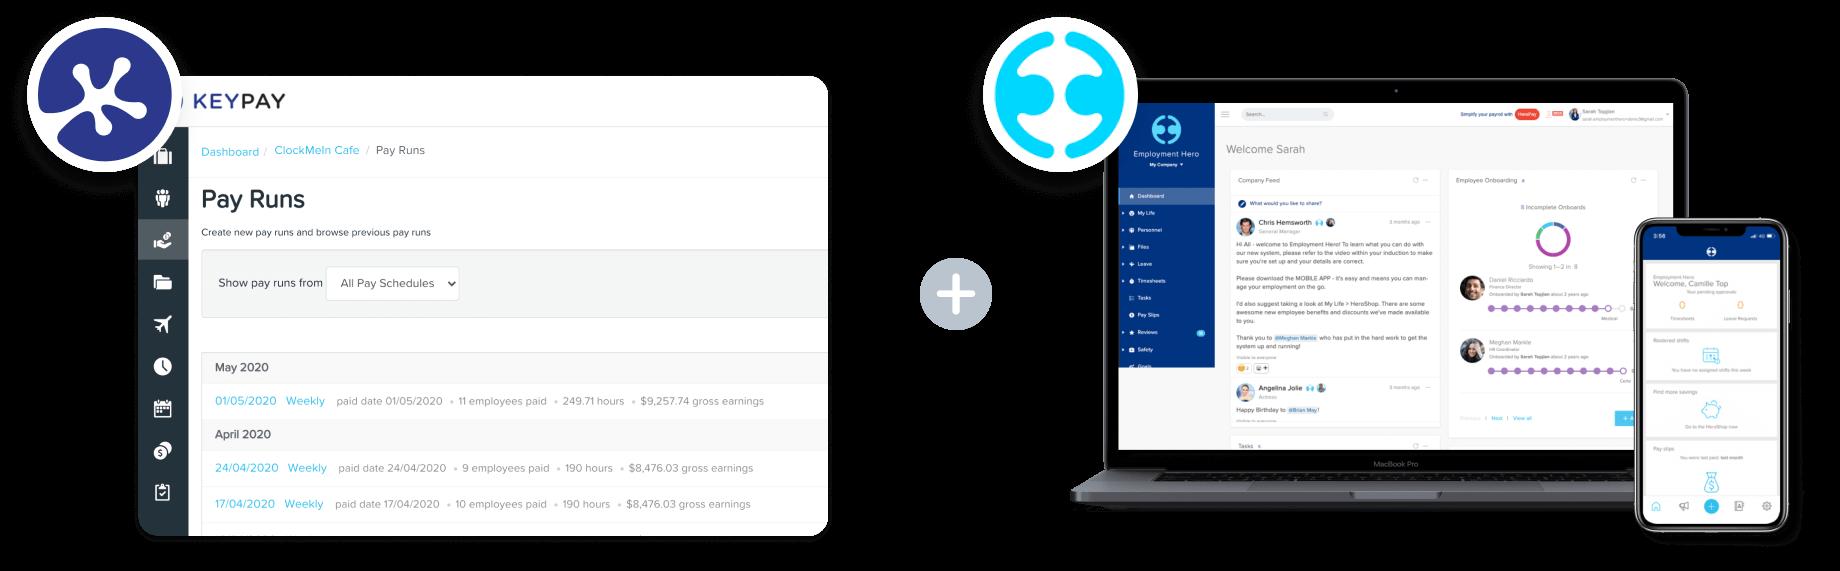 KeyPay Employment Hero Dashboard